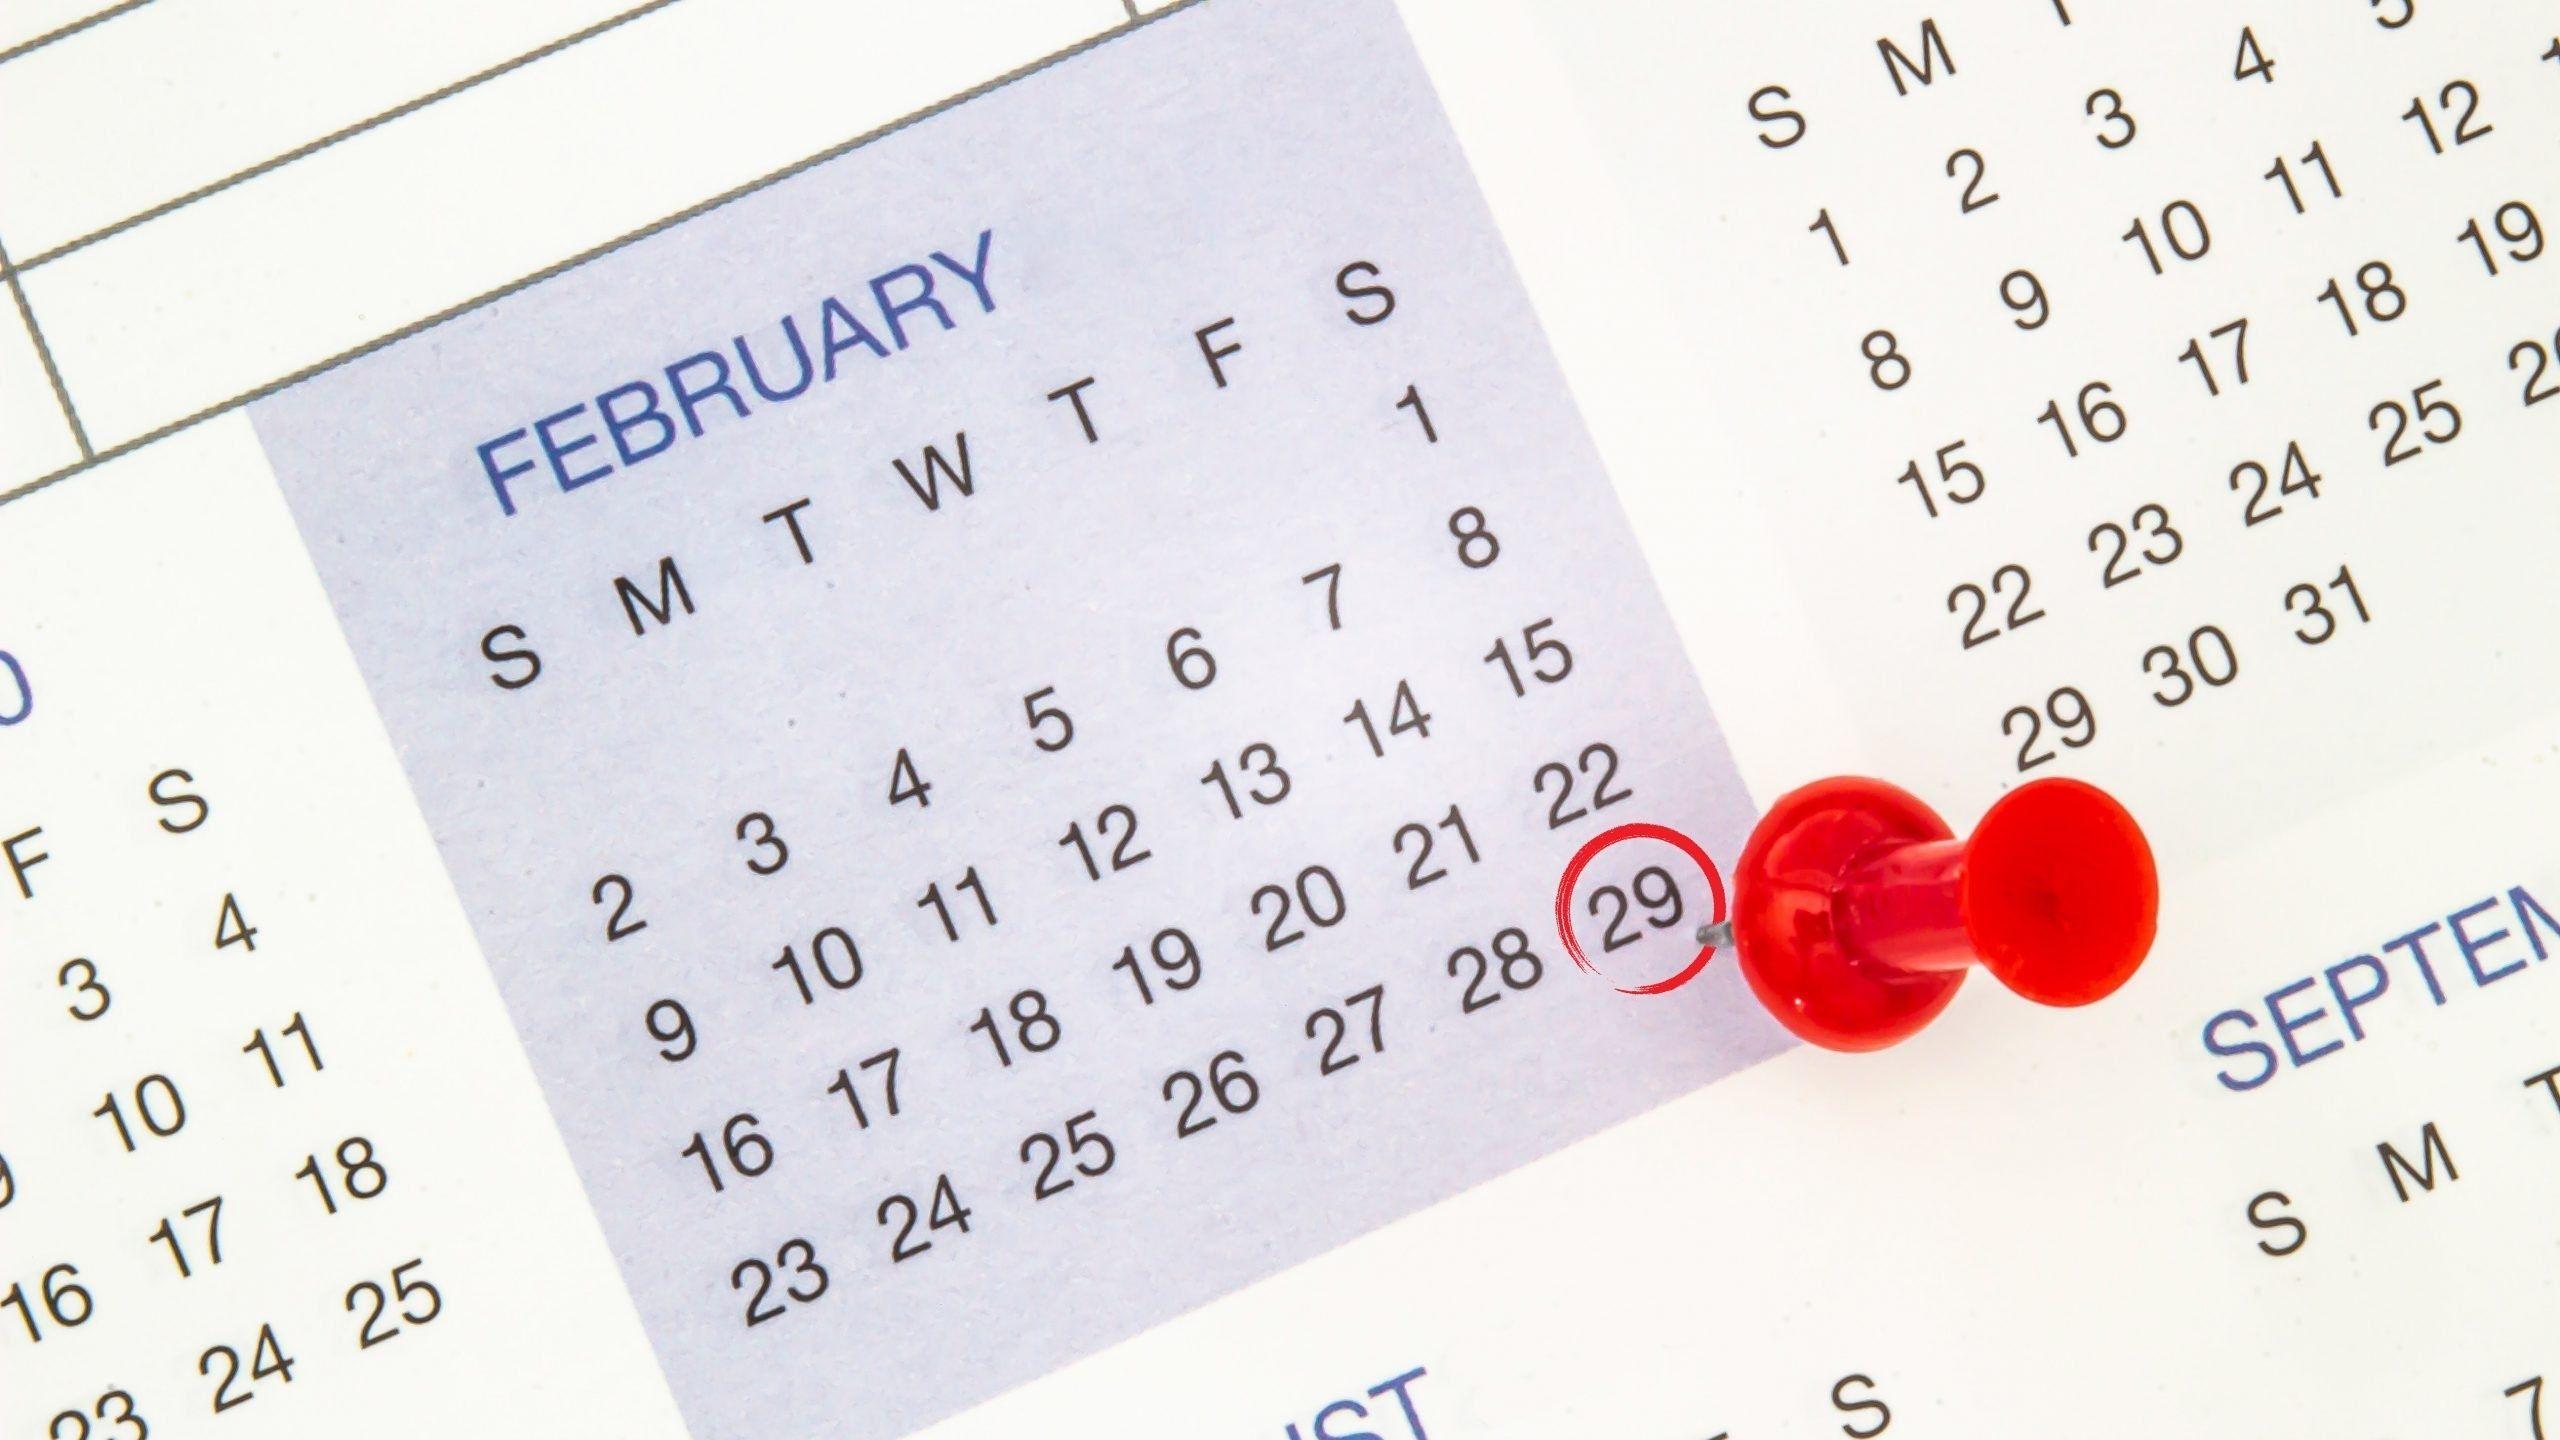 Julian Calendar For Leap Year In 2020 Leap Year Calendar Leap Day Leap Year